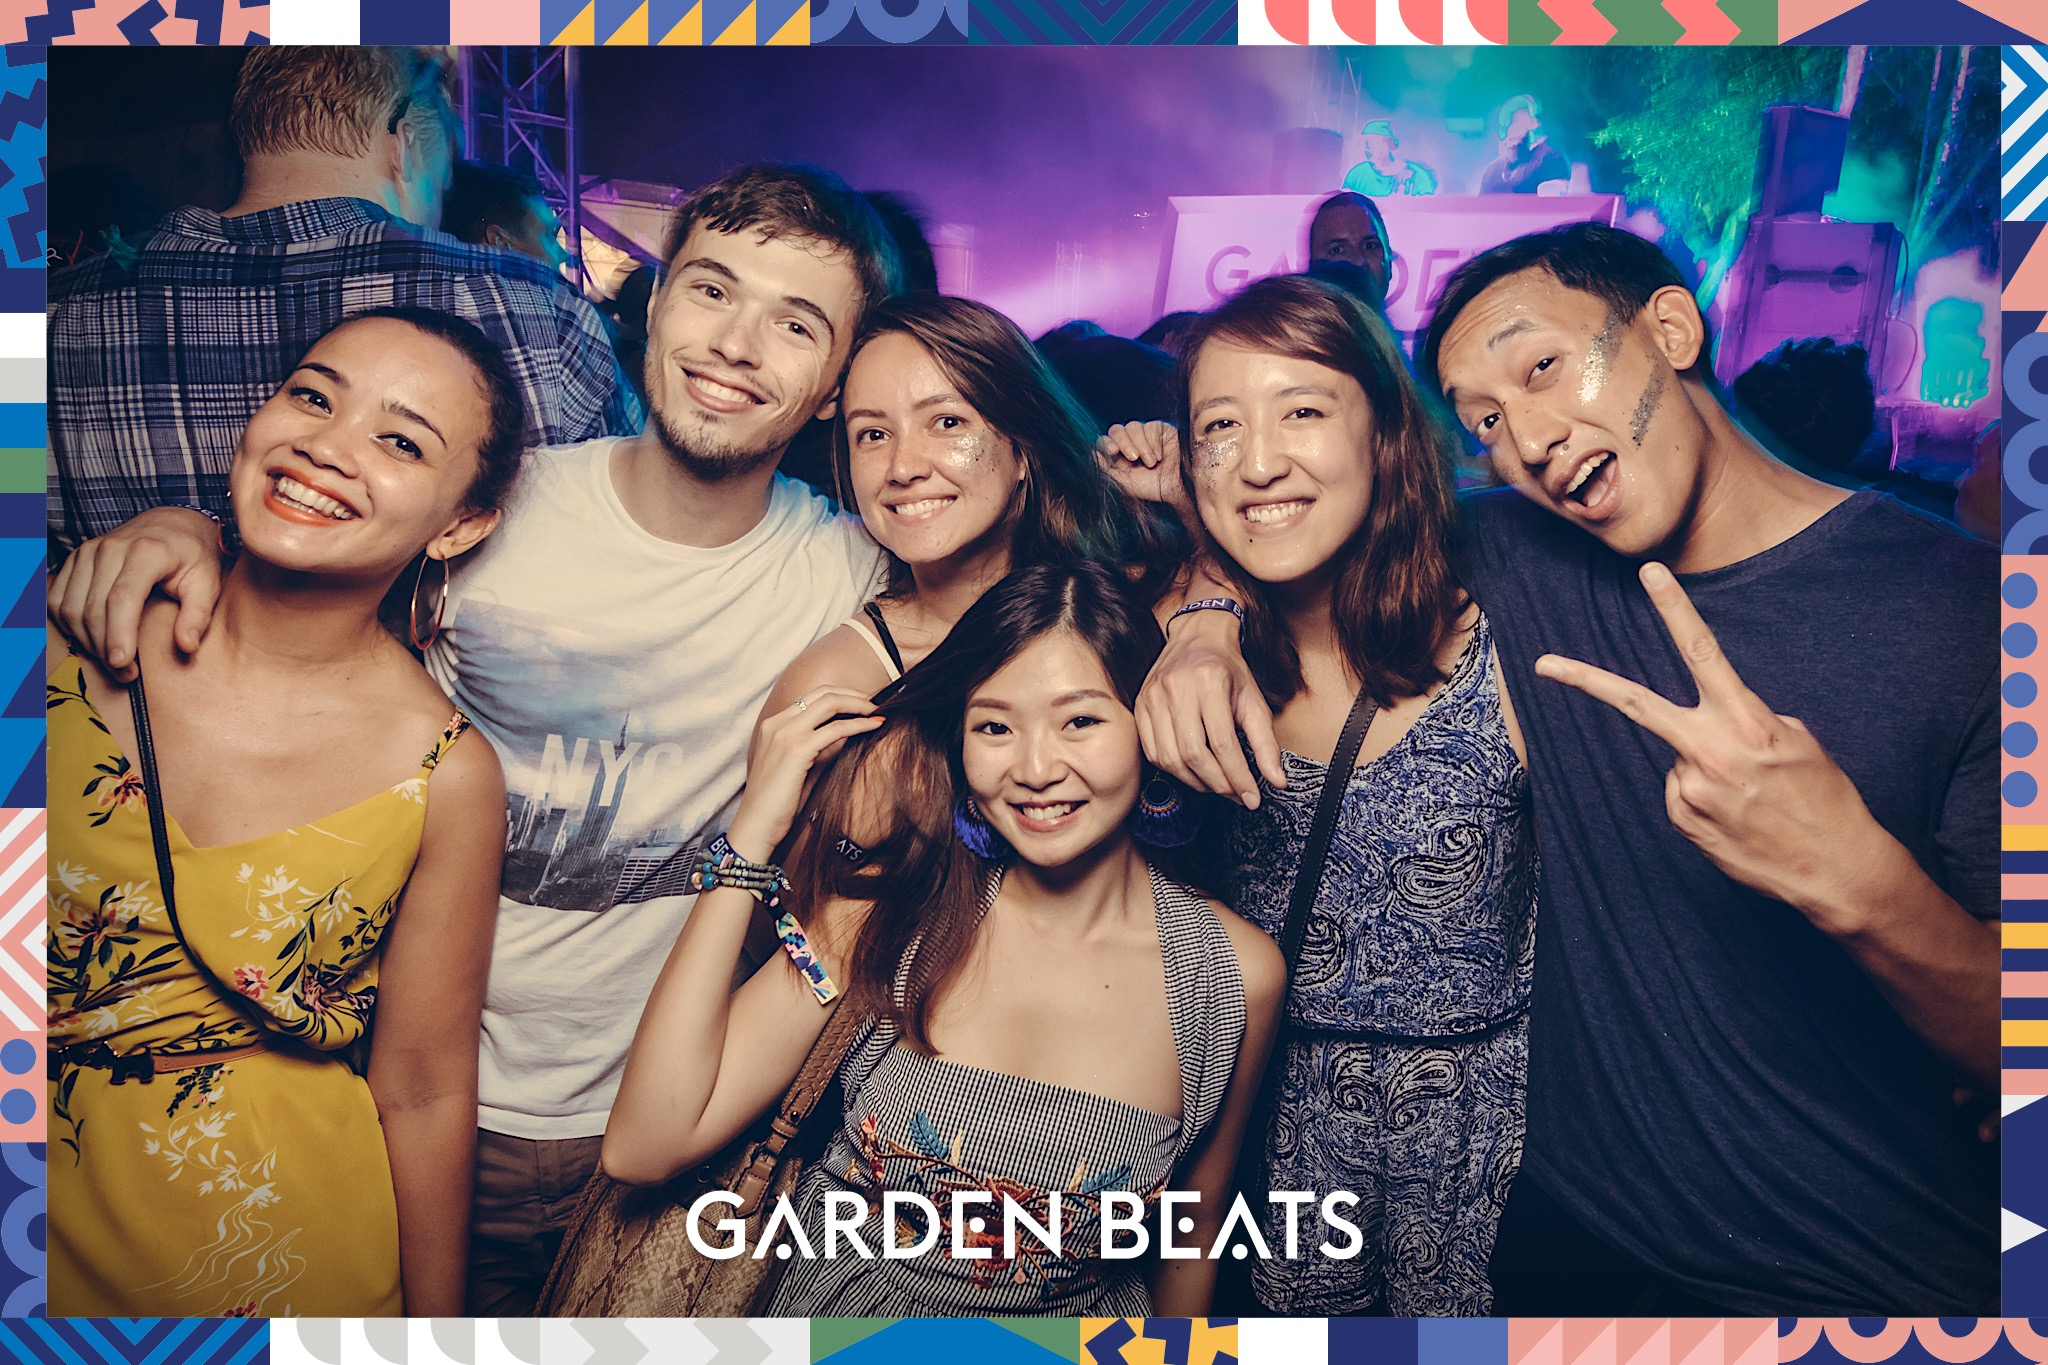 03032018_GardenBeats_Colossal818_Watermarked.jpg